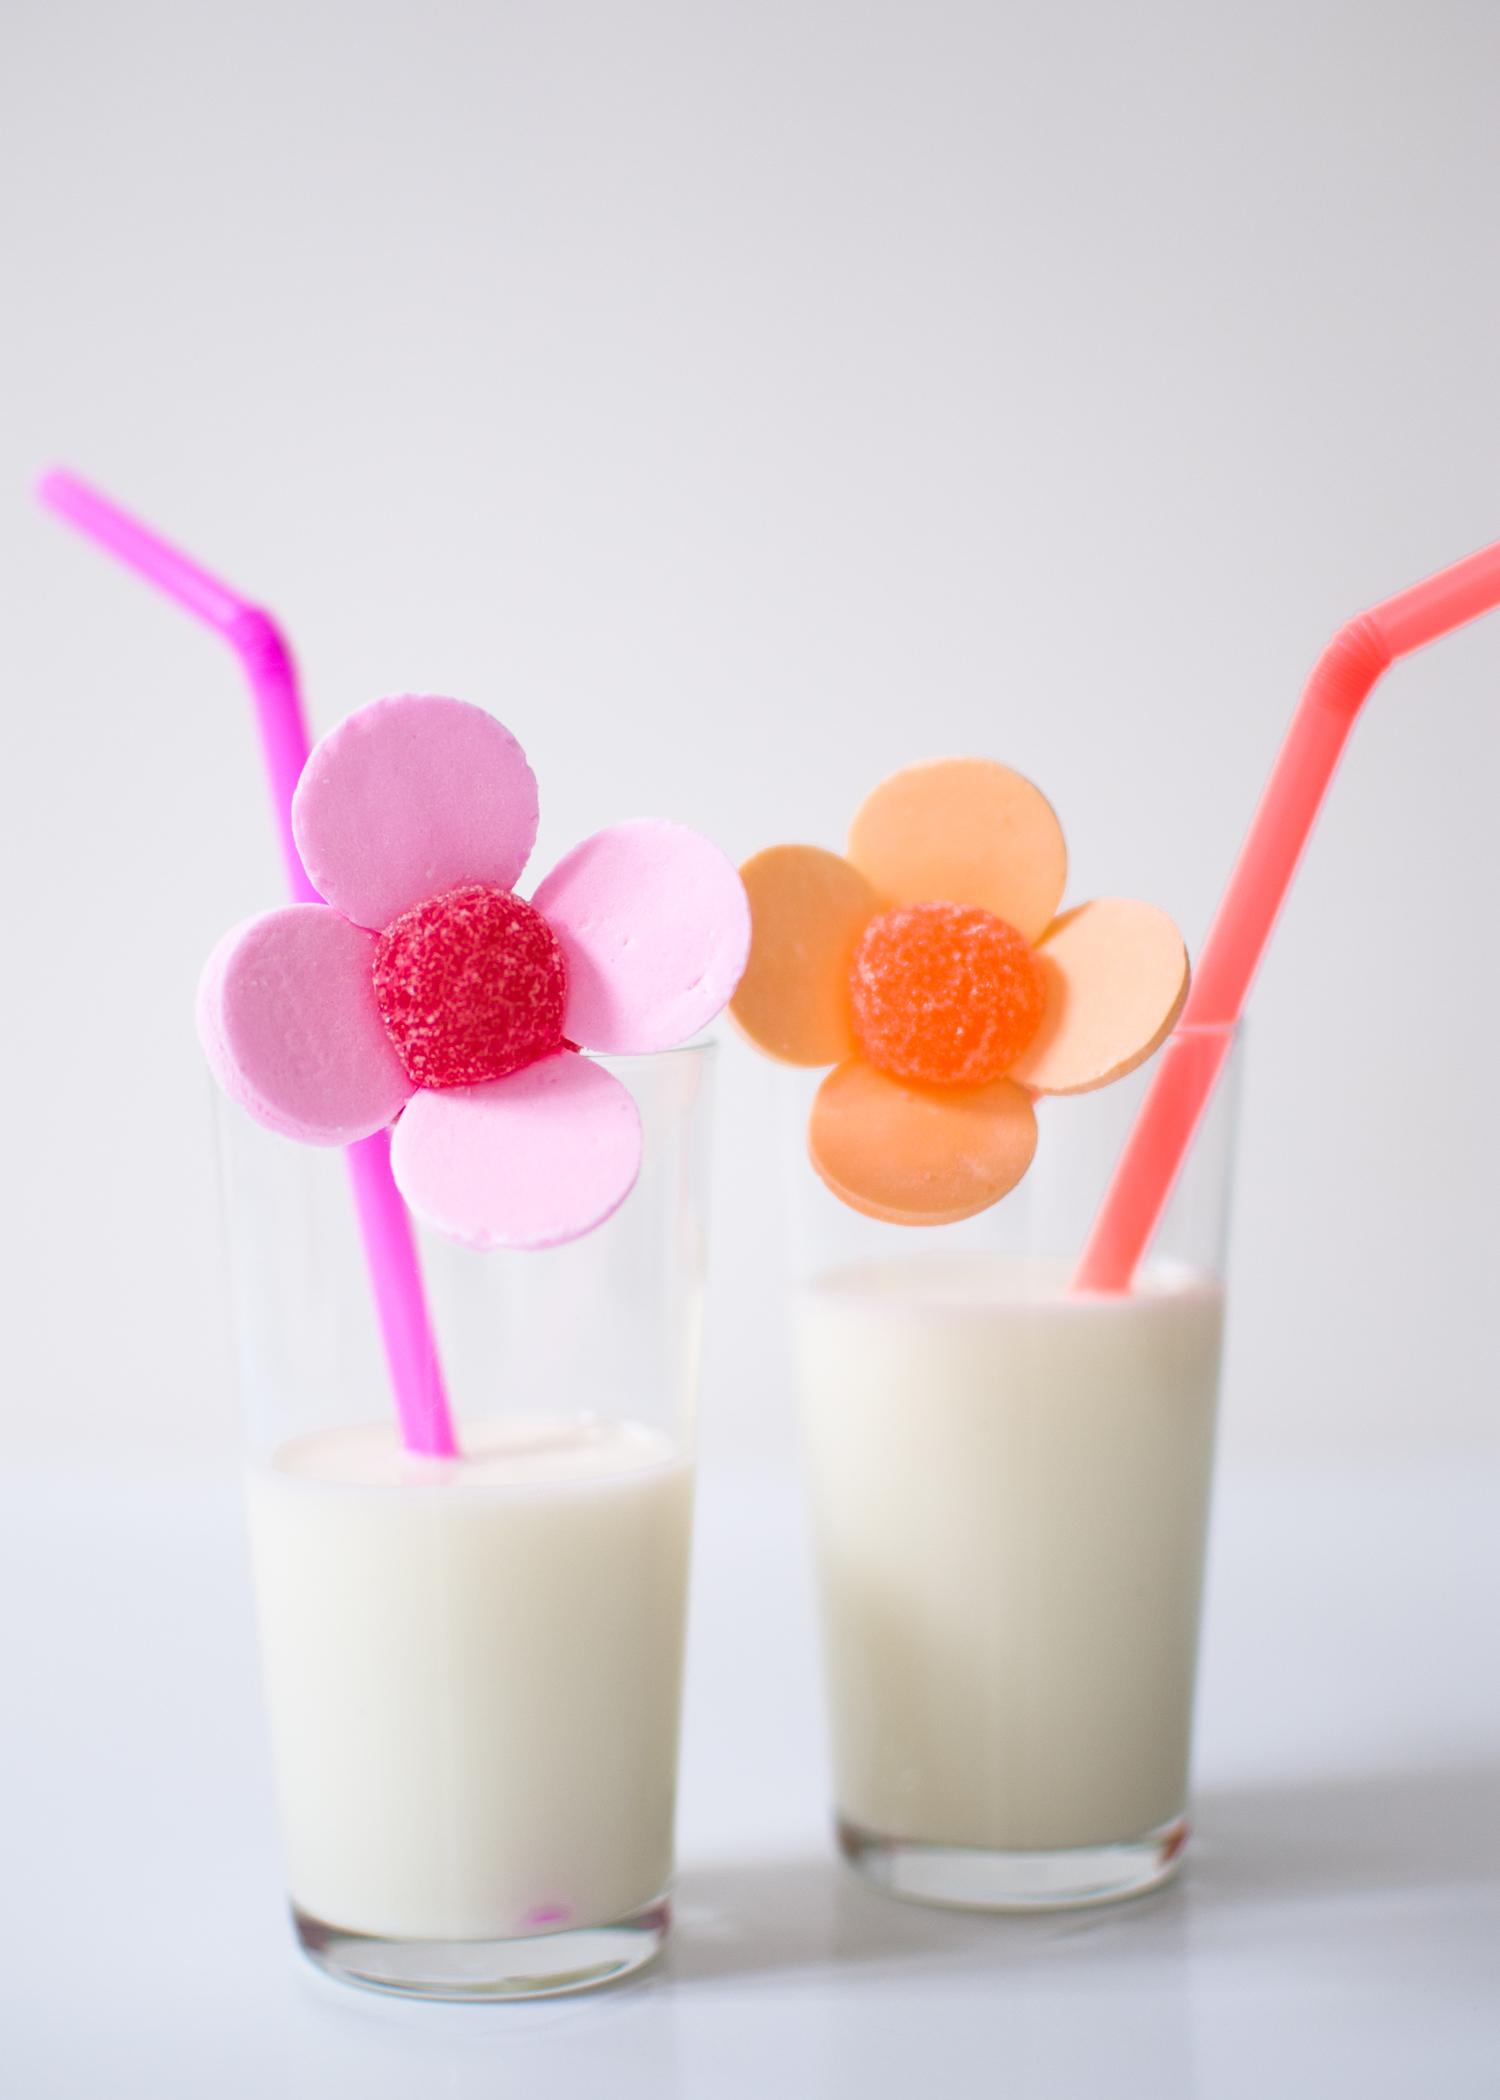 gumdrop-flowers-candy-aisle-crafts